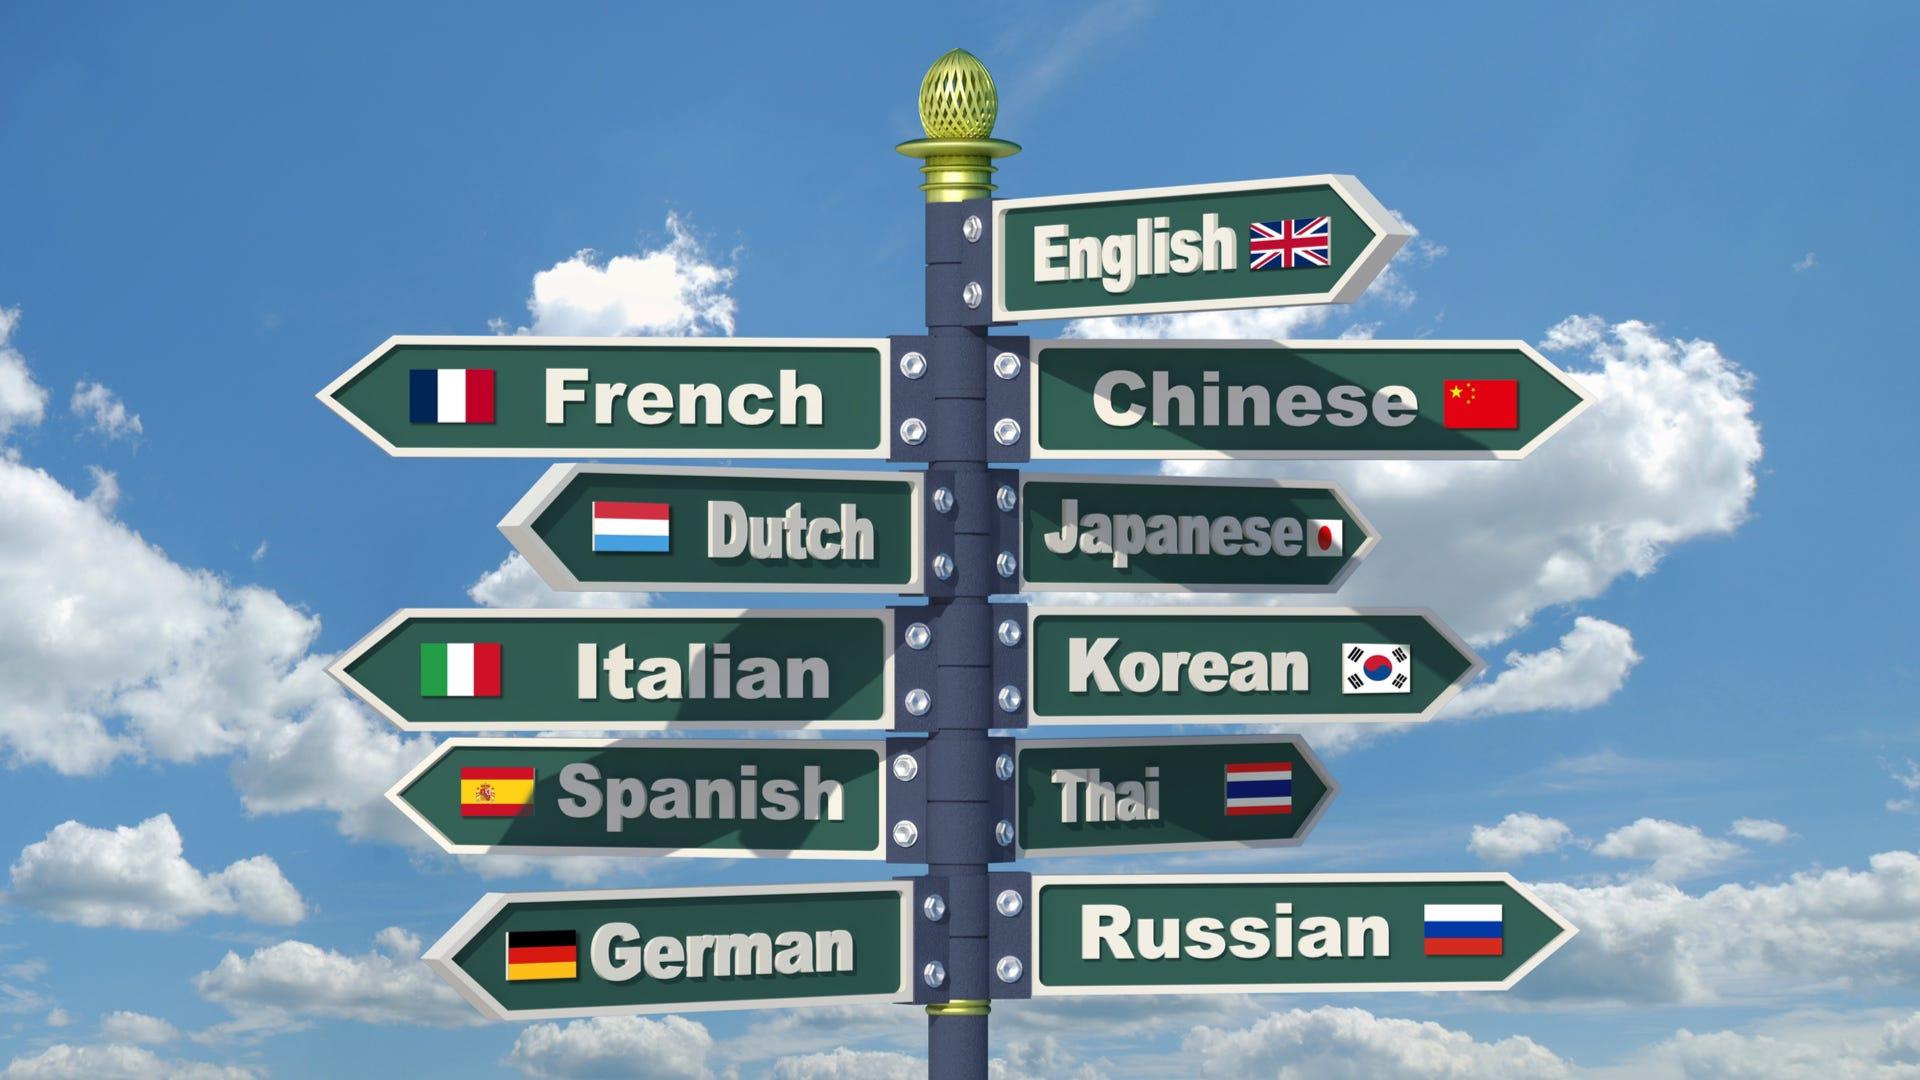 Road signs displaying various language names from English to Italian to Korean